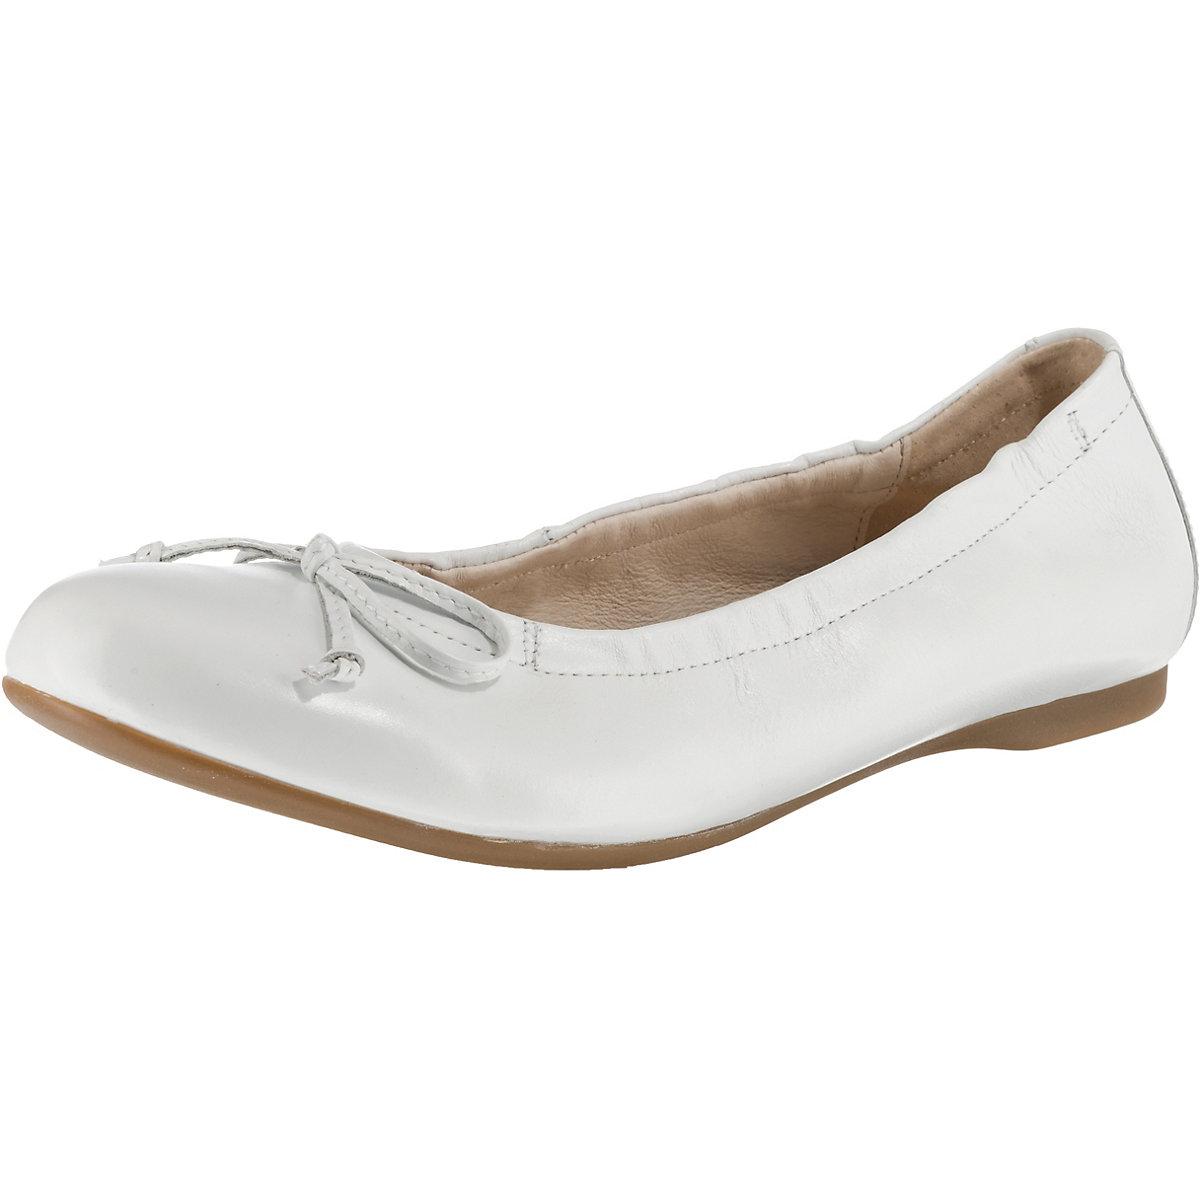 Gabor, Klassische Ballerinas, weiß